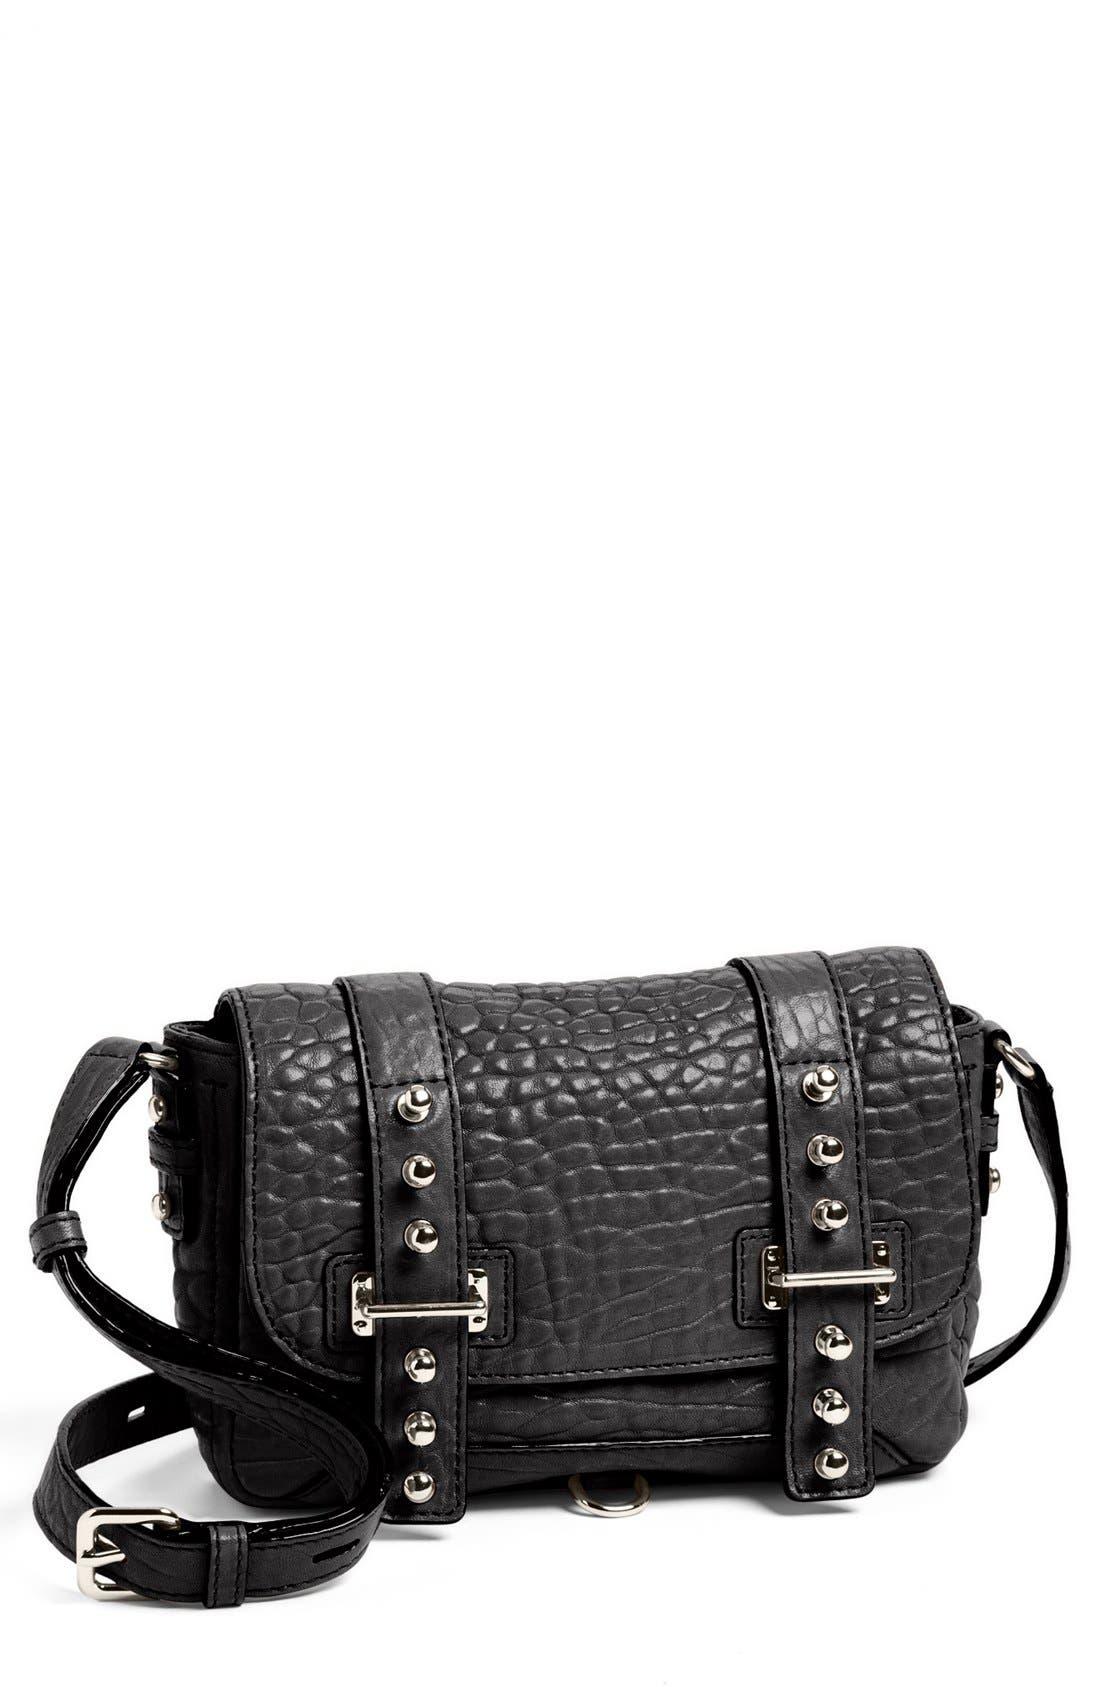 REBECCA MINKOFF 'Wilson' Leather Crossbody Bag, Small, Main, color, 001